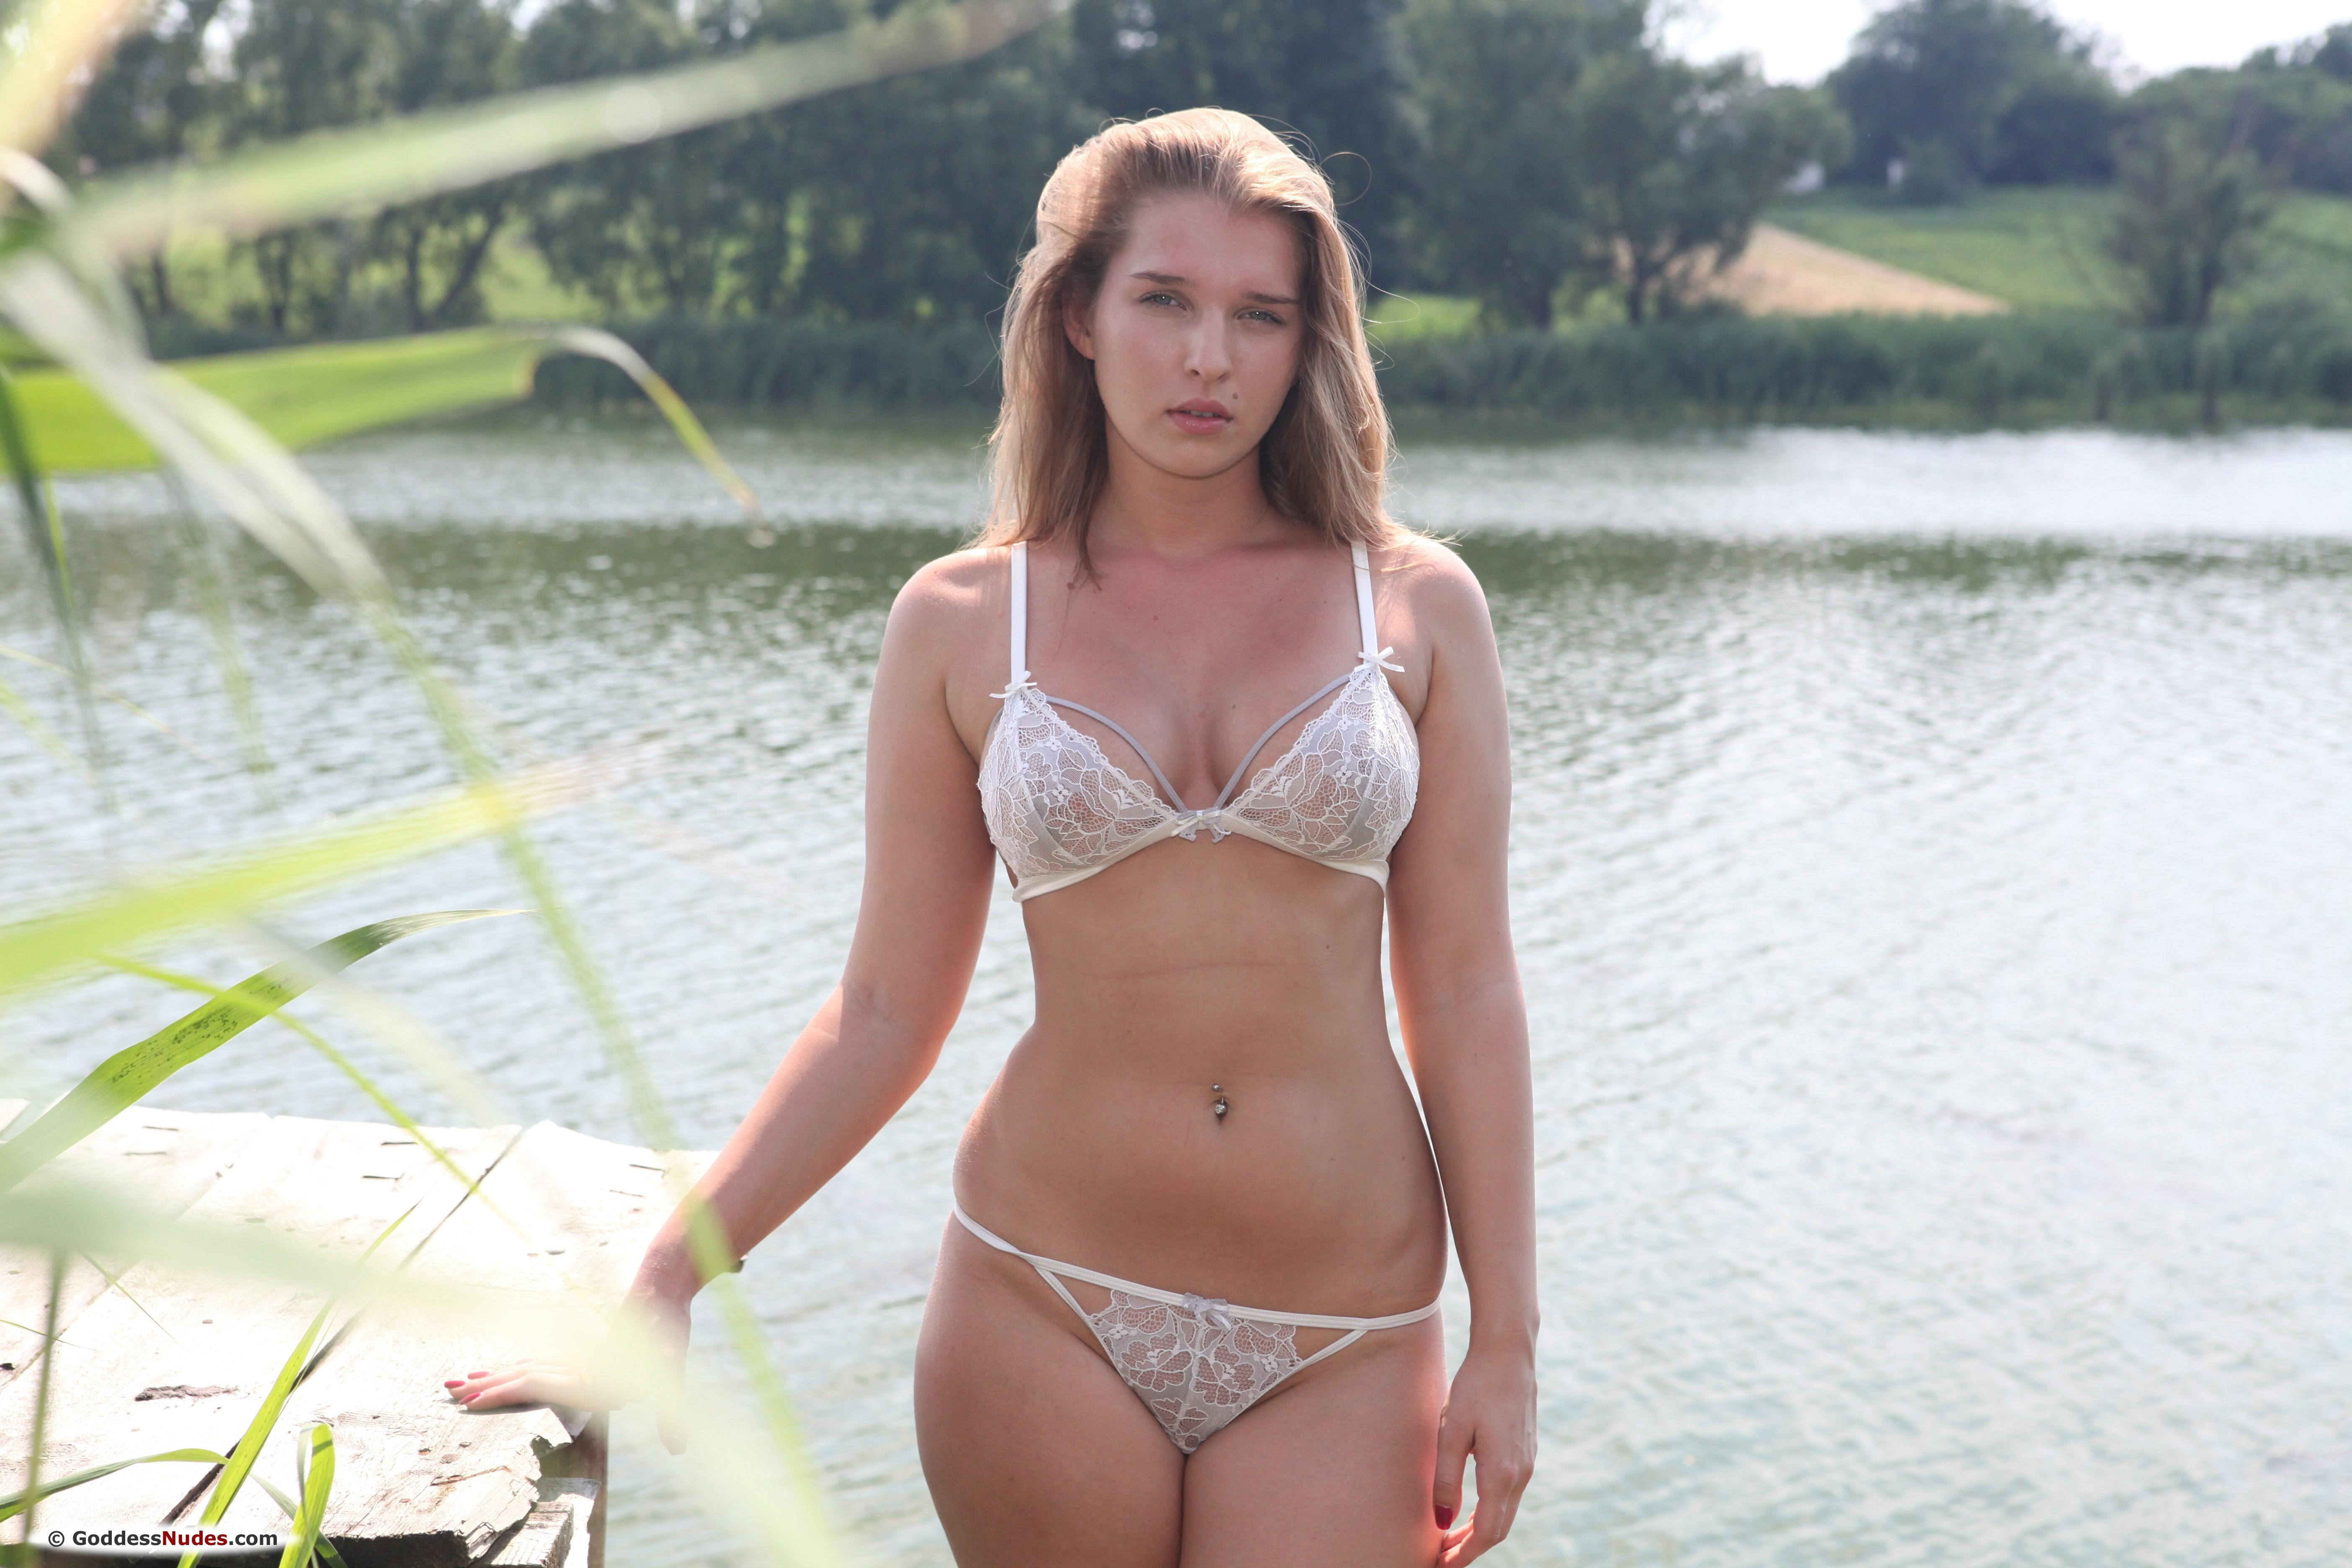 обои Stasia, красотка, голая, голая девушка картинки фото